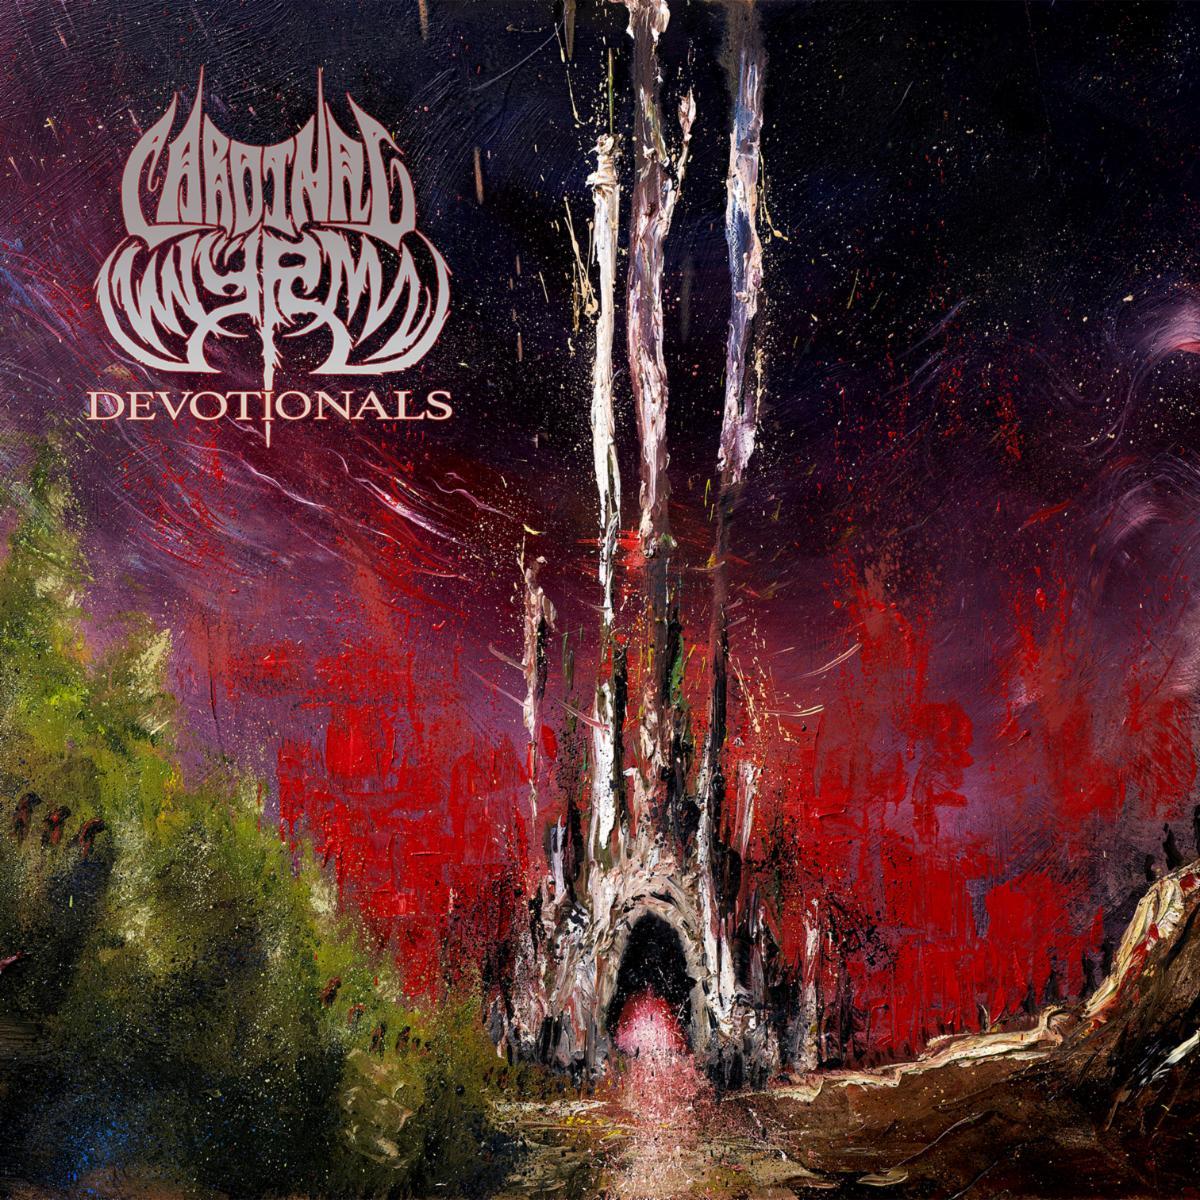 Cardinal Wyrm Album Devotionals